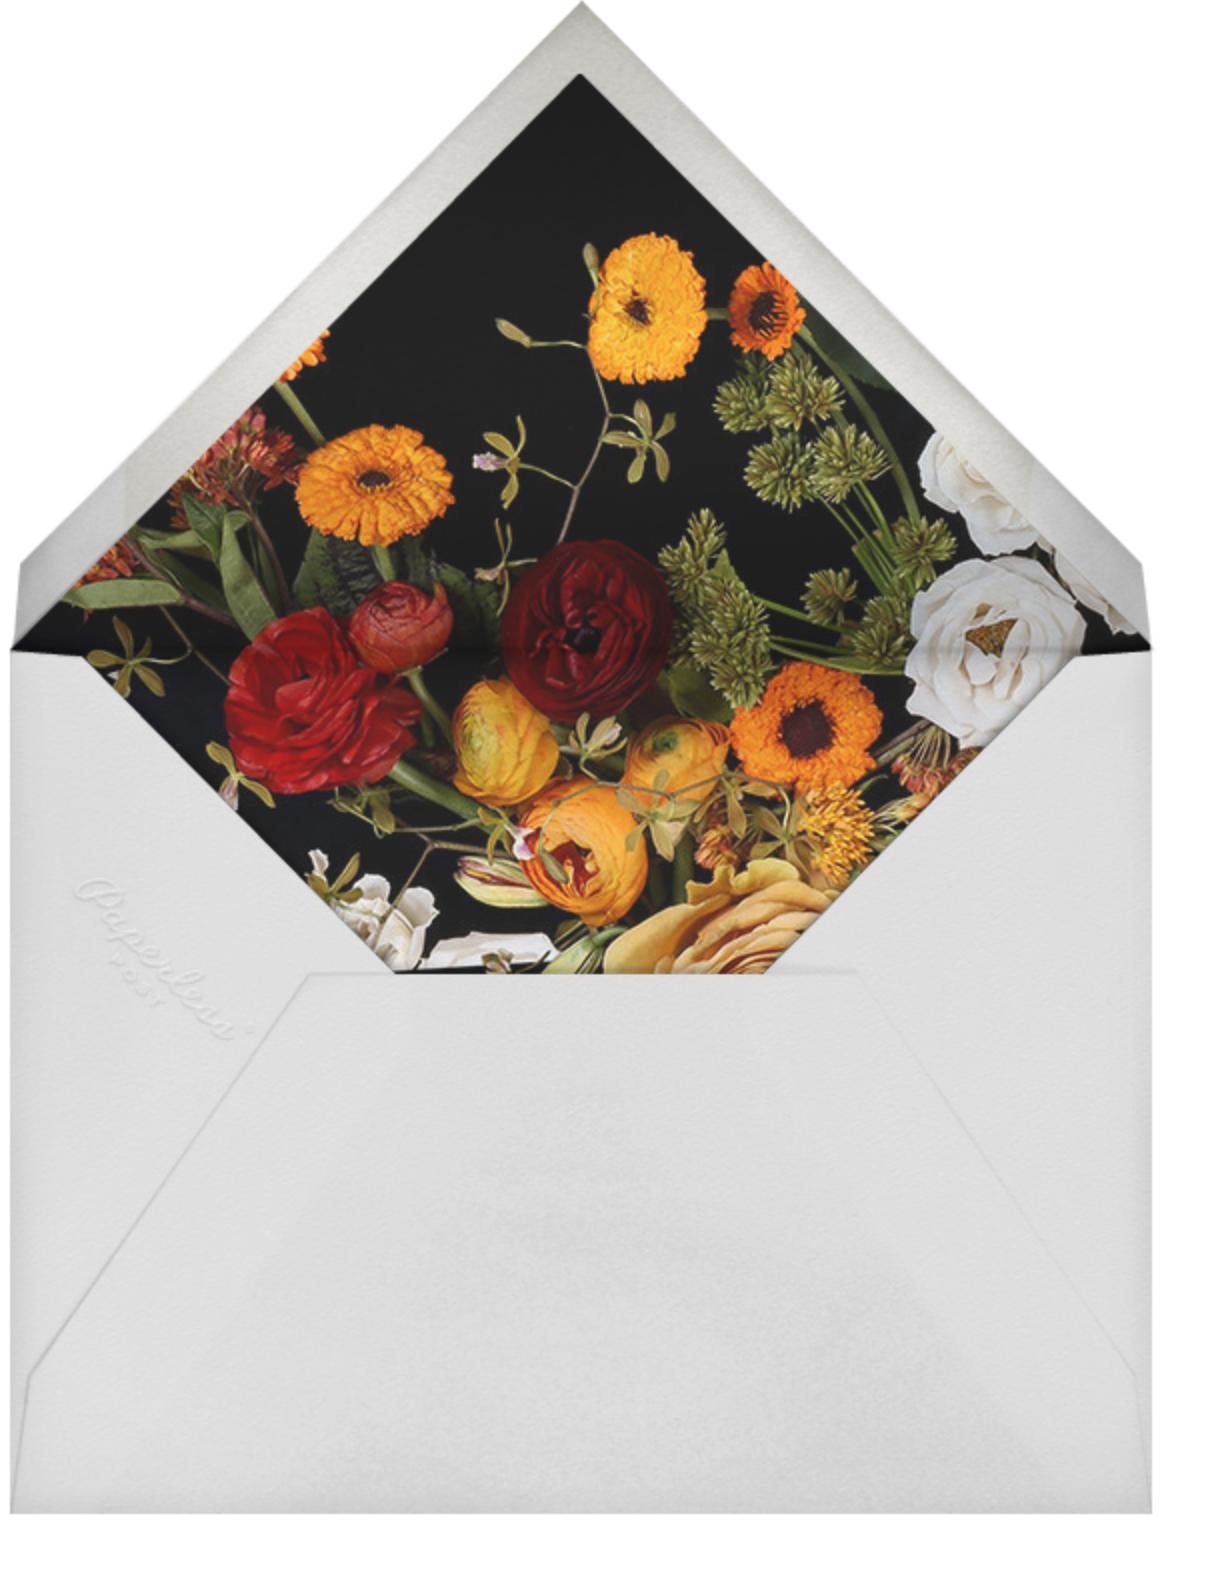 Vendémiaire (Invitation) - Putnam & Putnam - All - envelope back